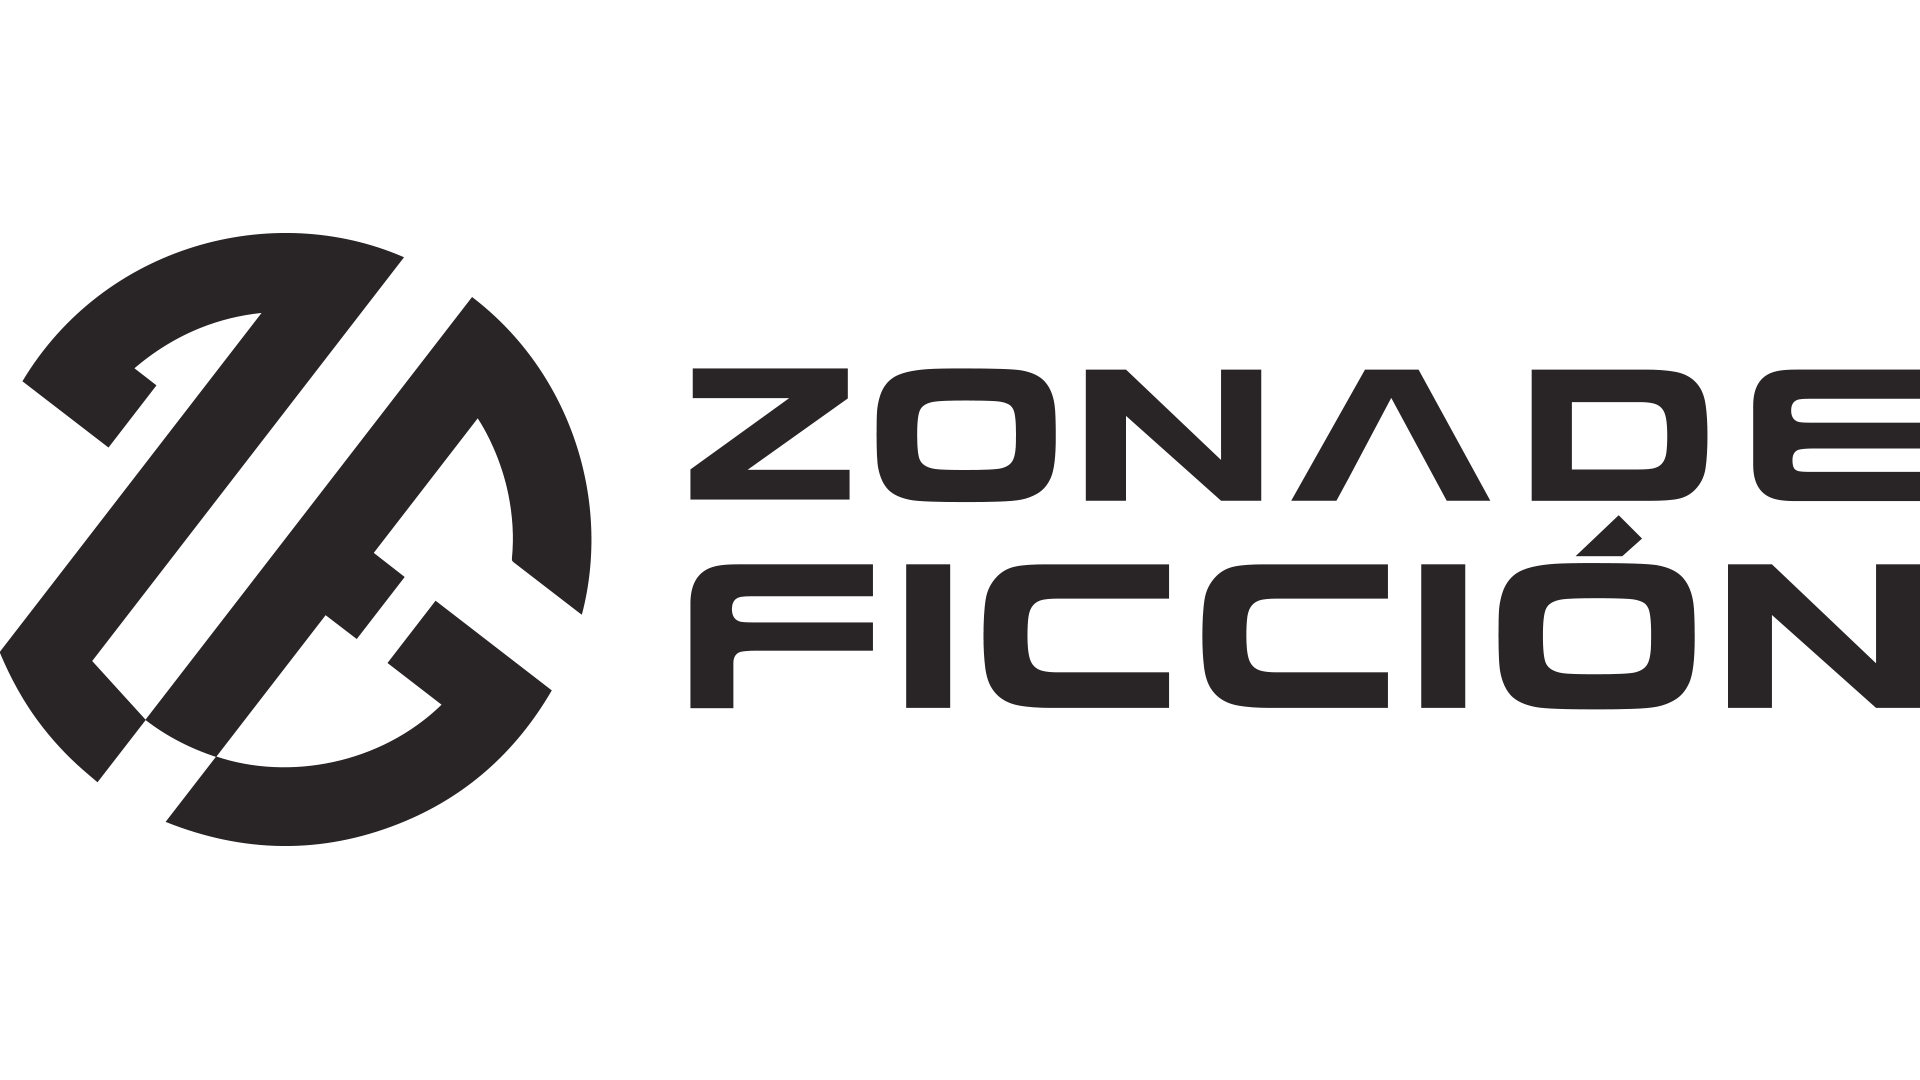 logo zona de ficcion zdf